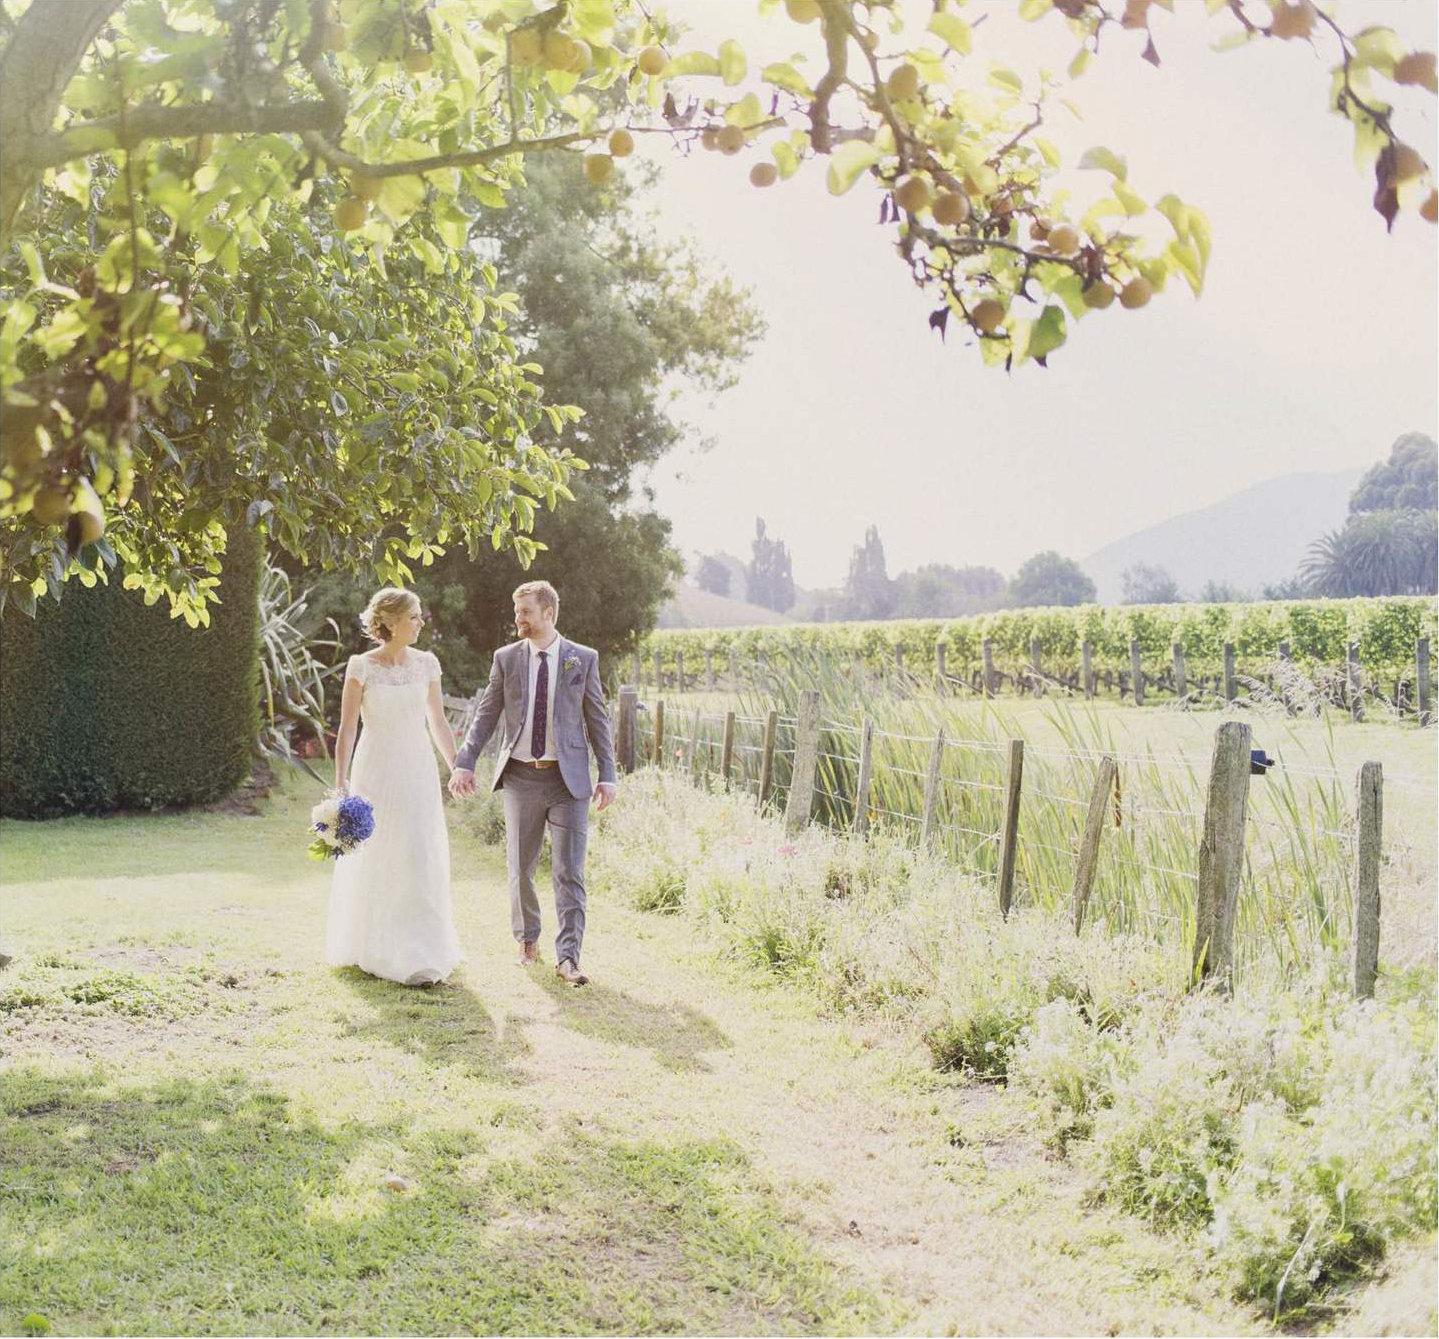 Hawkes-Bay-wedding-siaosi-photography12.JPG